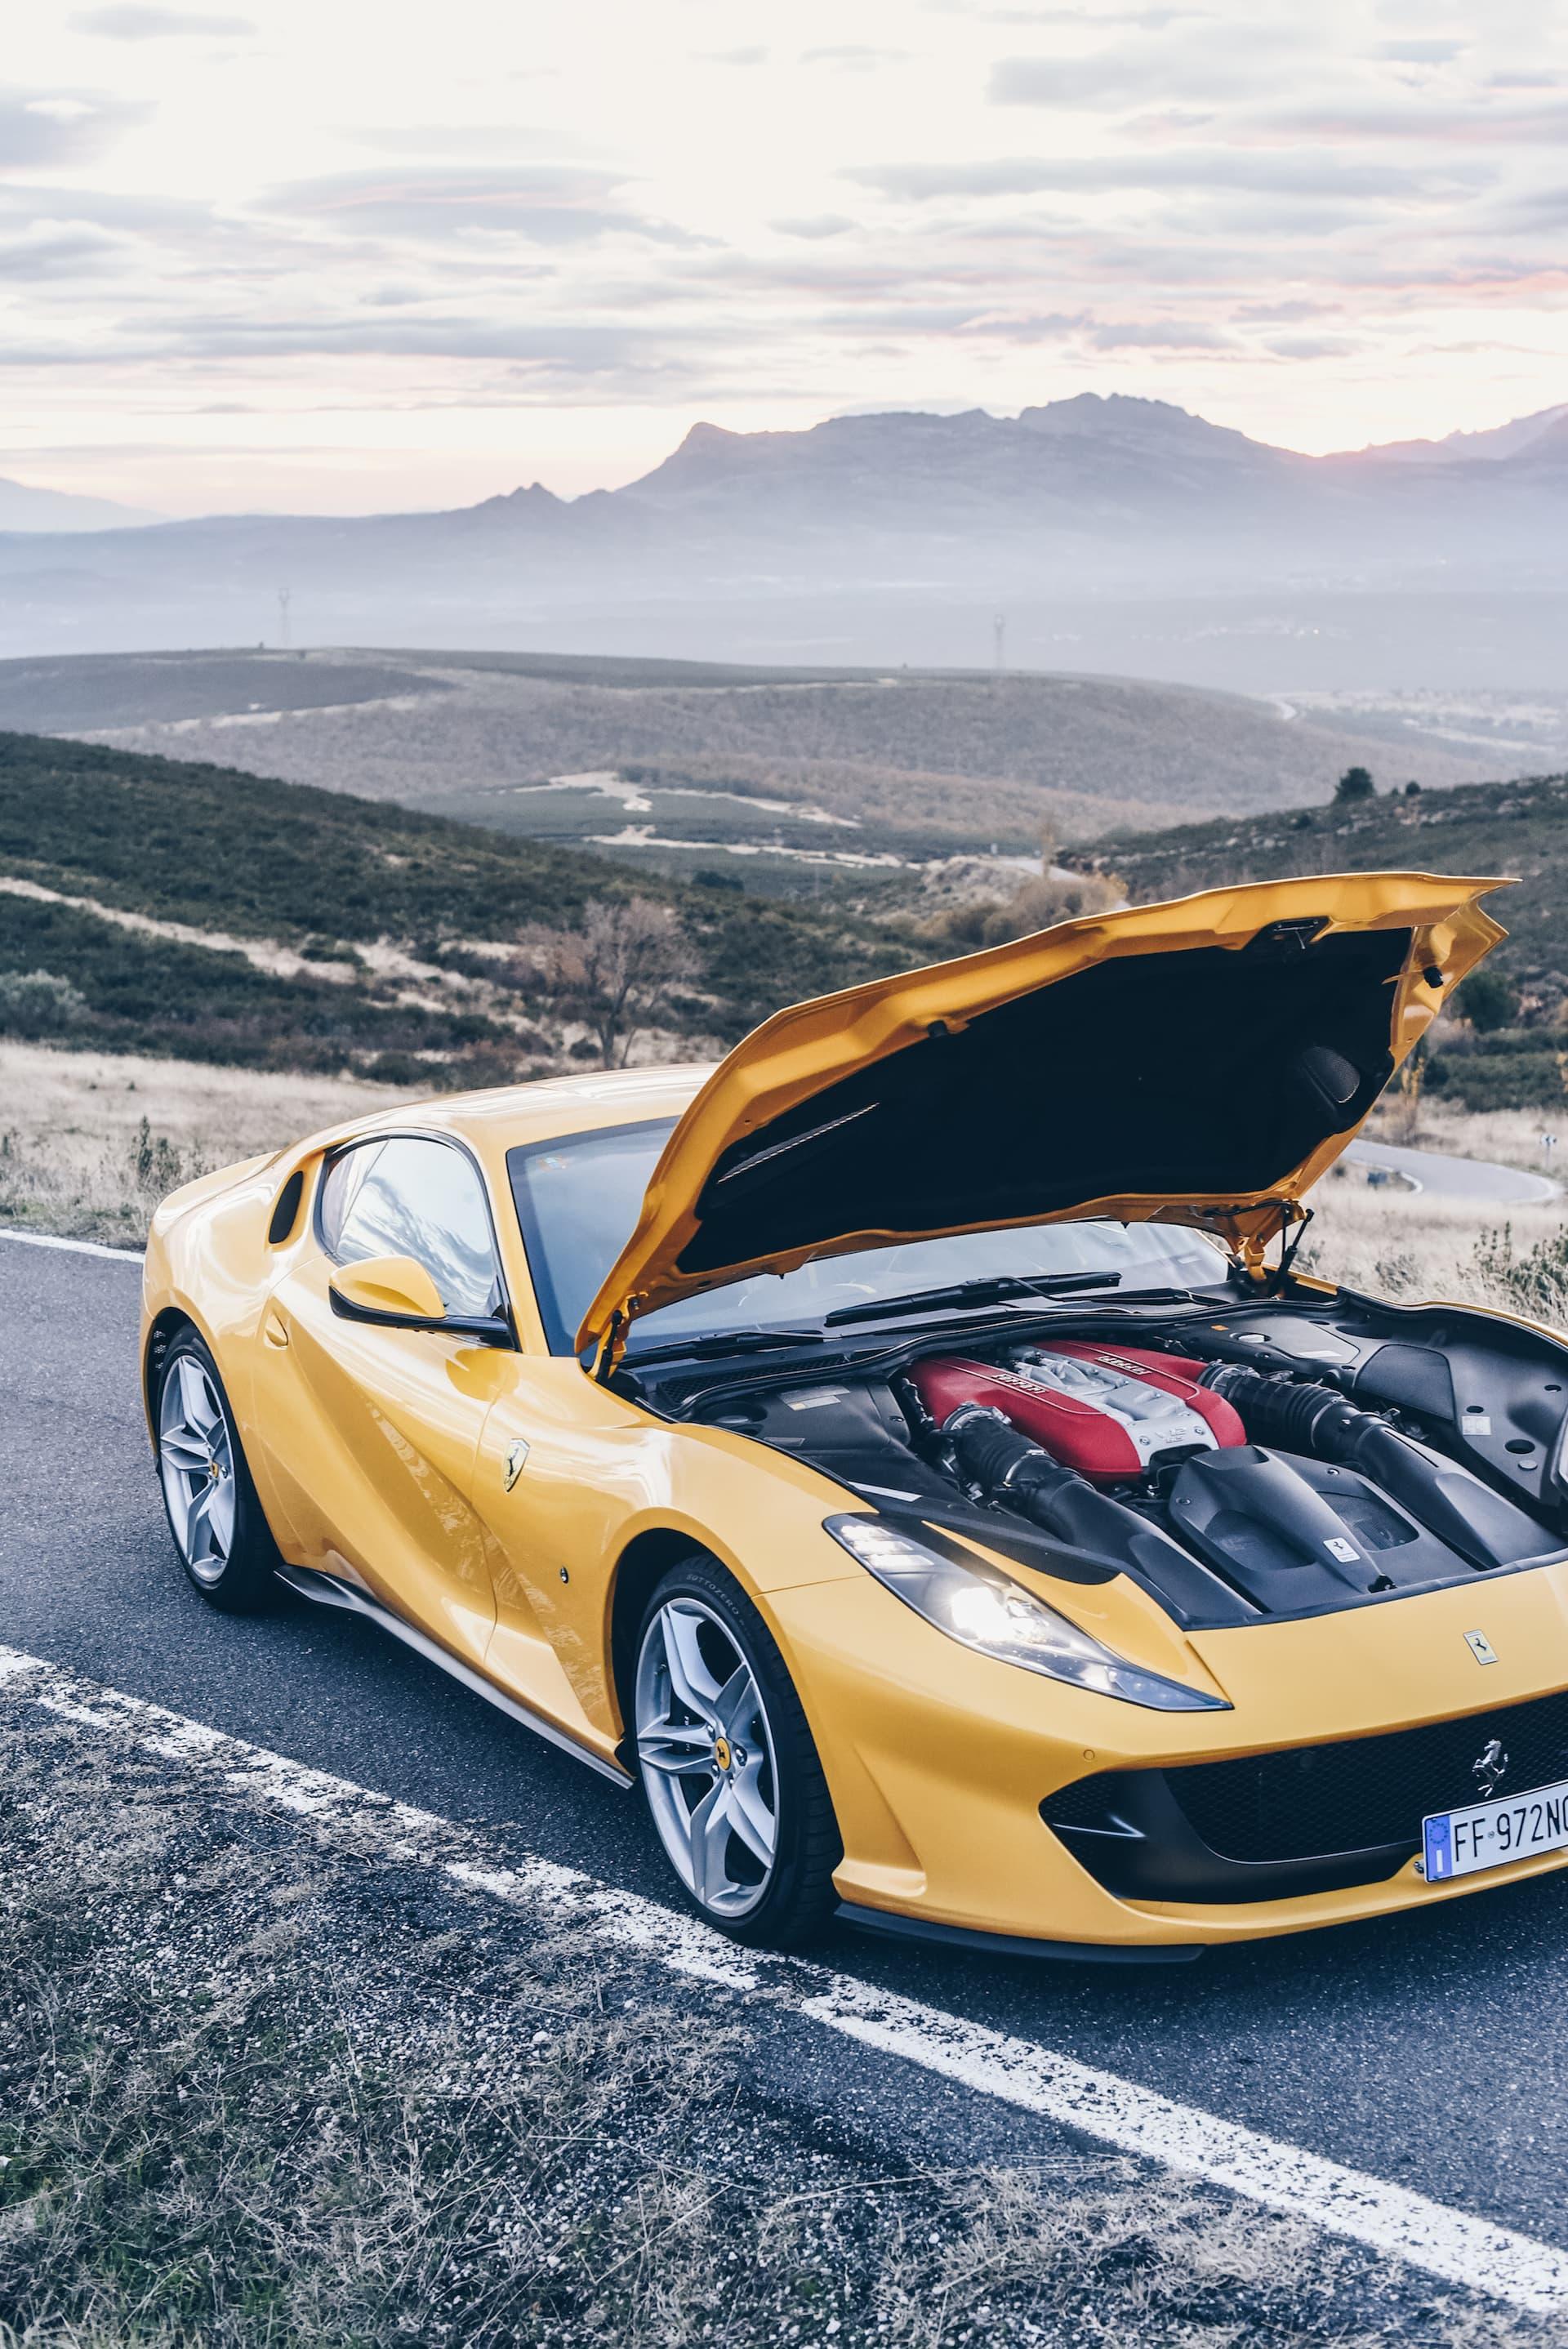 Ferrari Dm 45